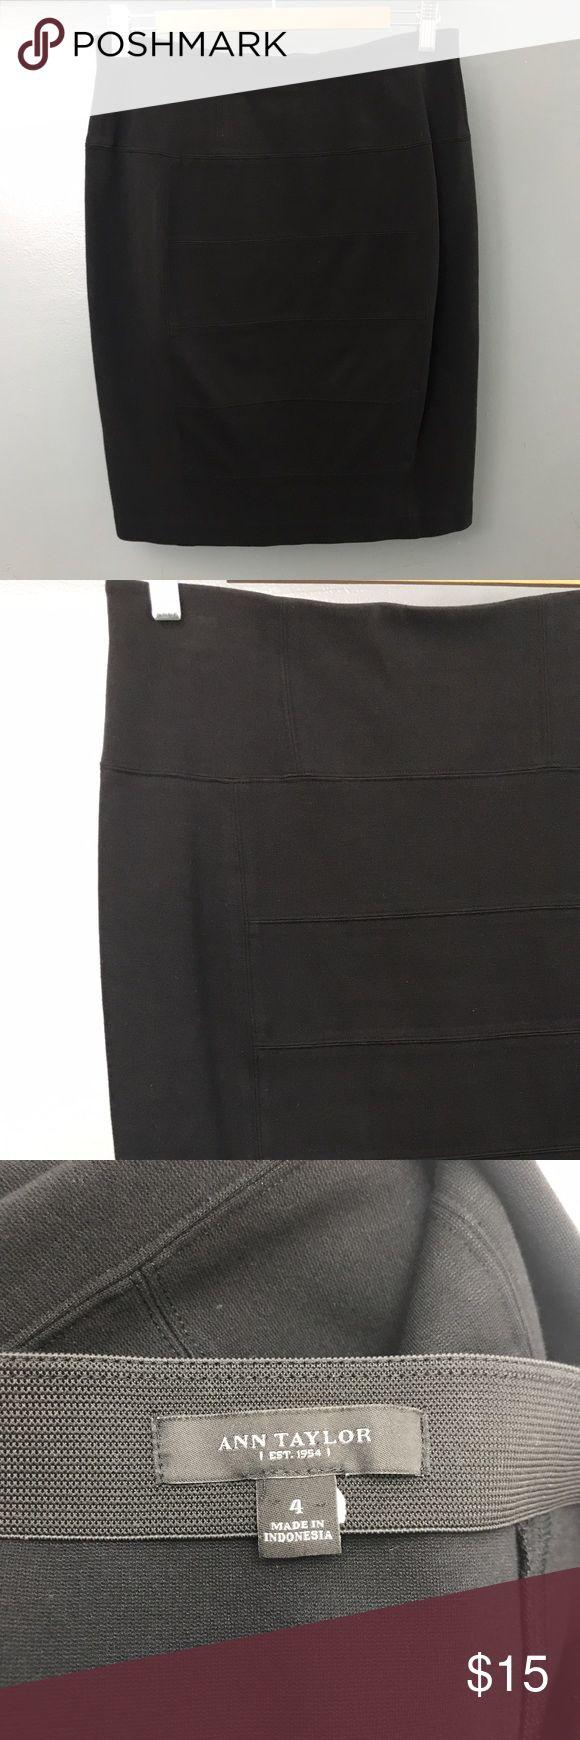 Ann Taylor stretch pencil skirt size 4 Ann Taylor black stretch pencil skirt size 4 dress up or for work in EUC Ann Taylor Skirts Pencil